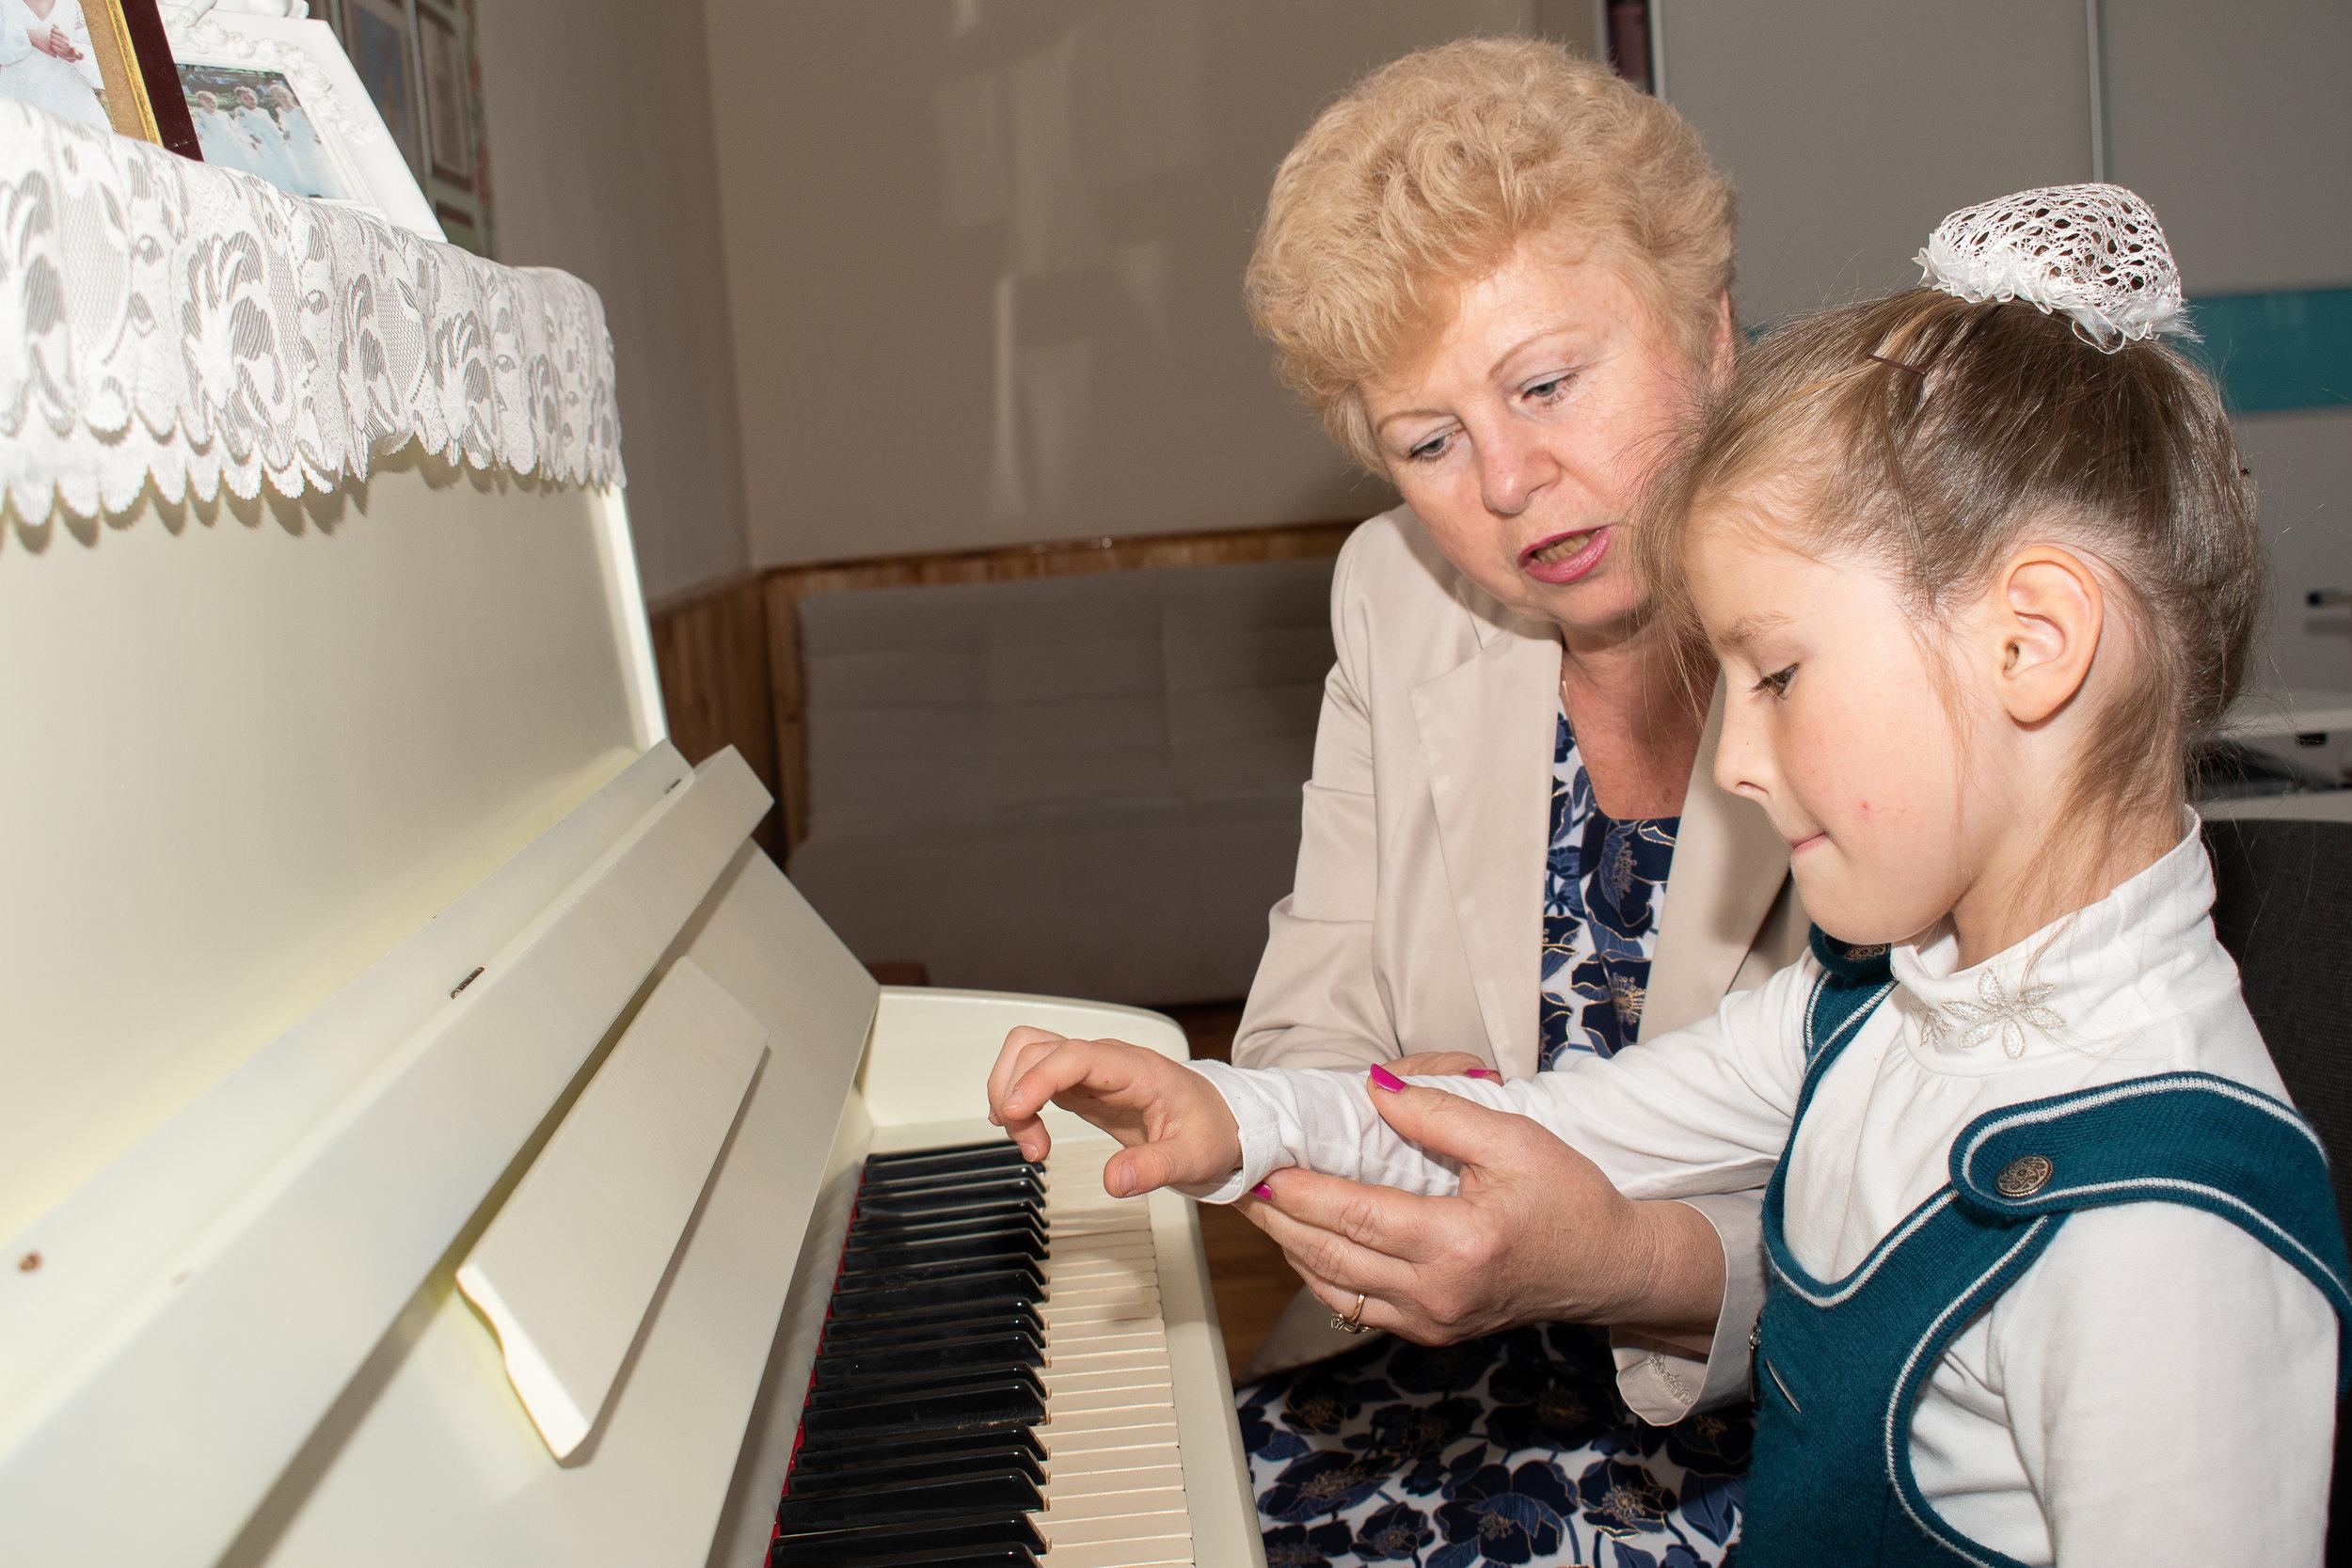 Музична школа - директор школи, хормейстерМоскалюк Анаїд Тигранівна